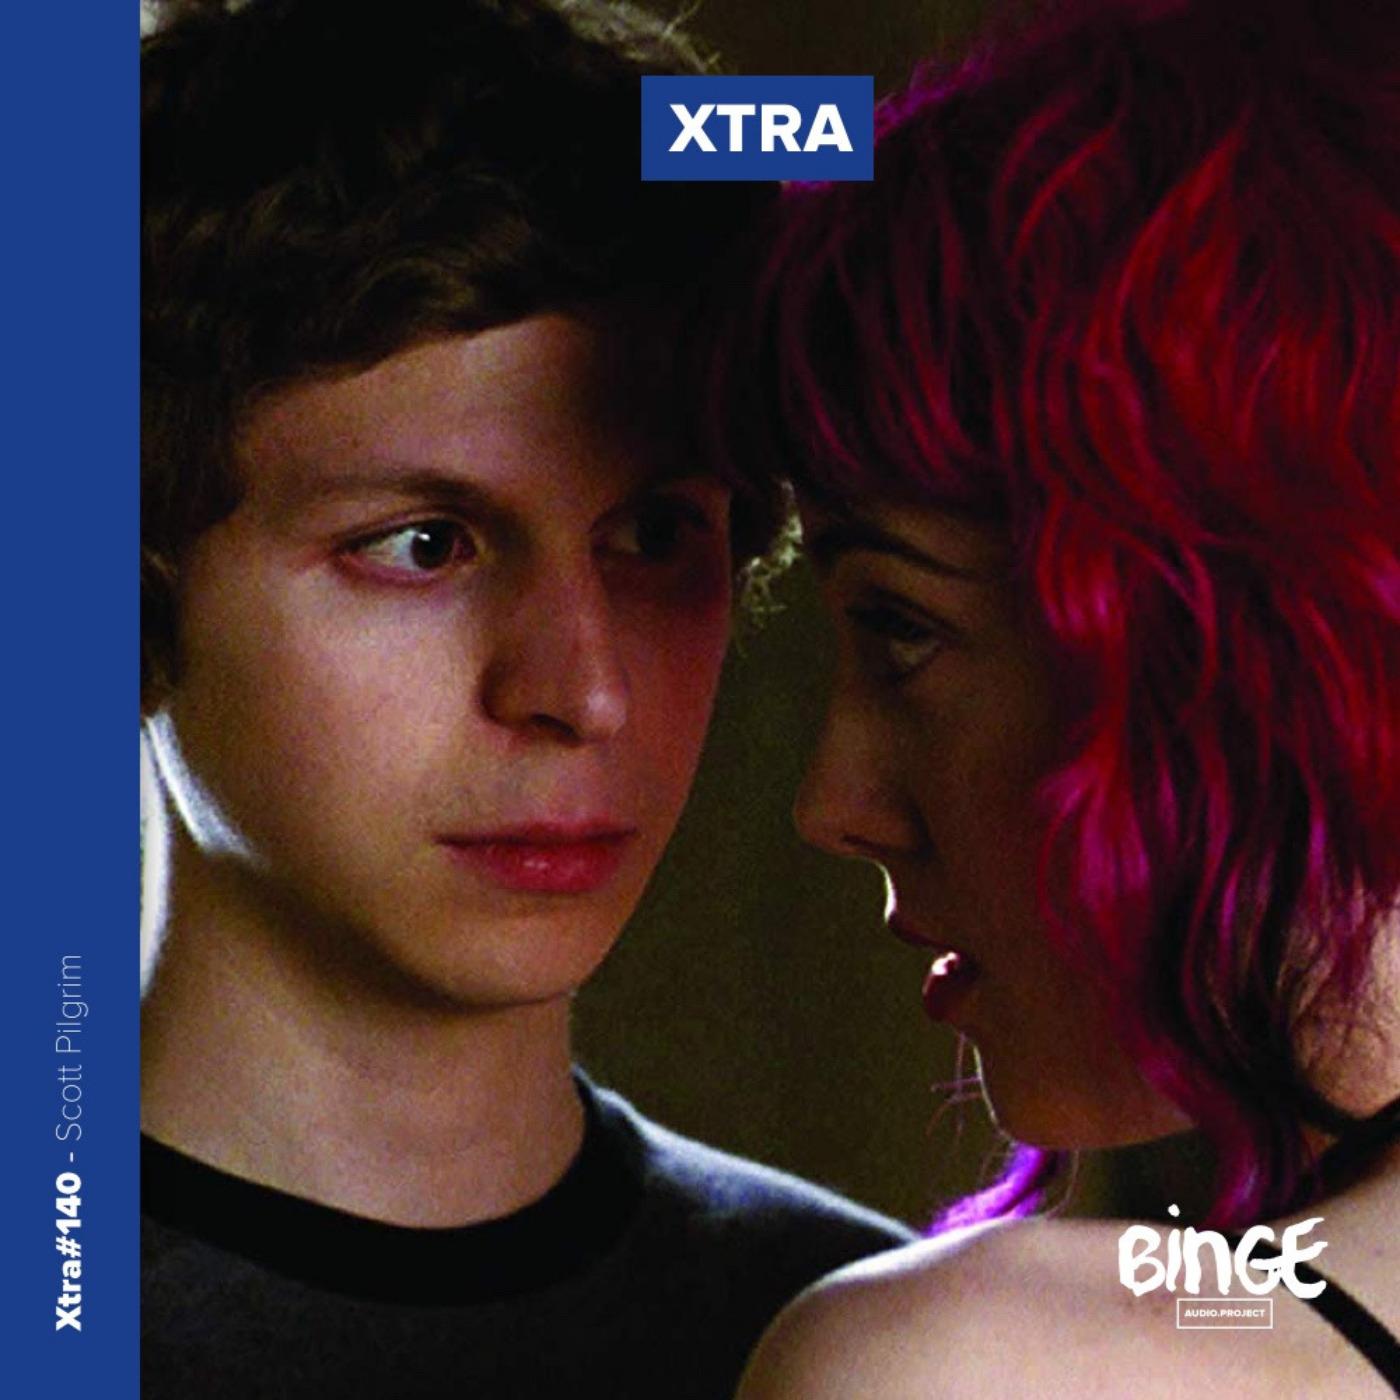 Xtra - Scott Pilgrim